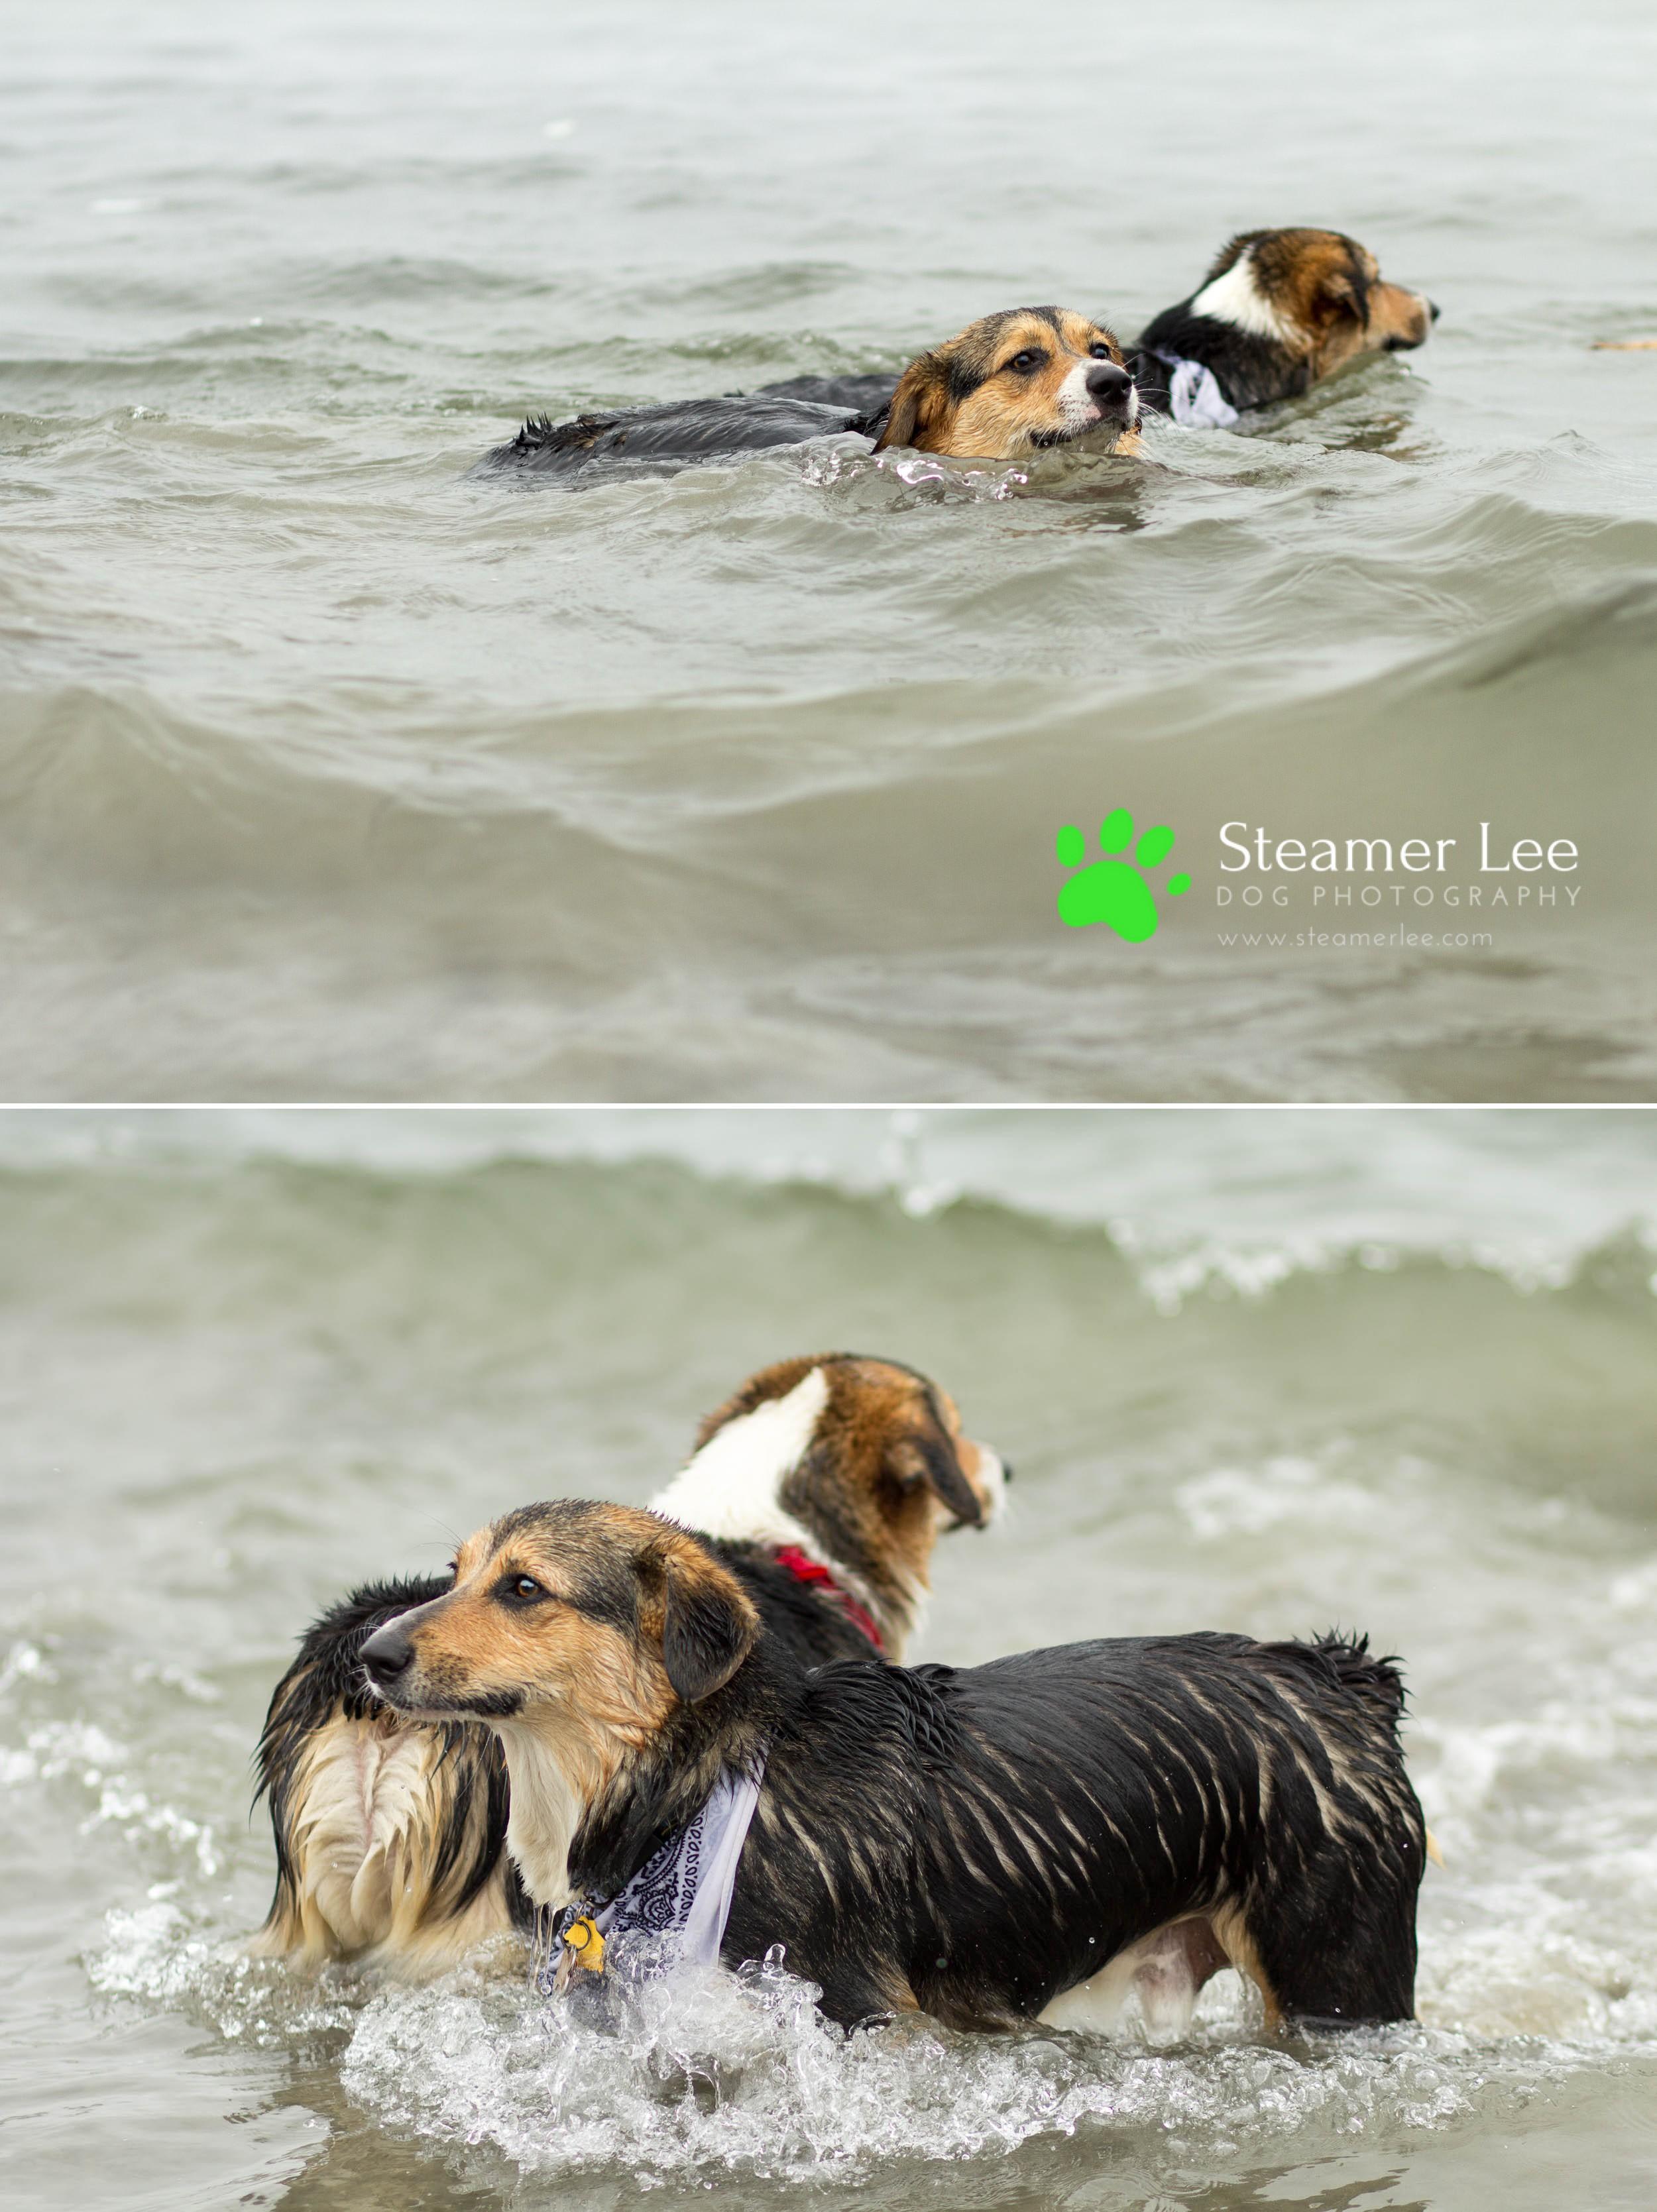 Steamer Lee Dog Photography - July 2017 So Cal Corgi Beach Day - Vol.2 - 13.jpg